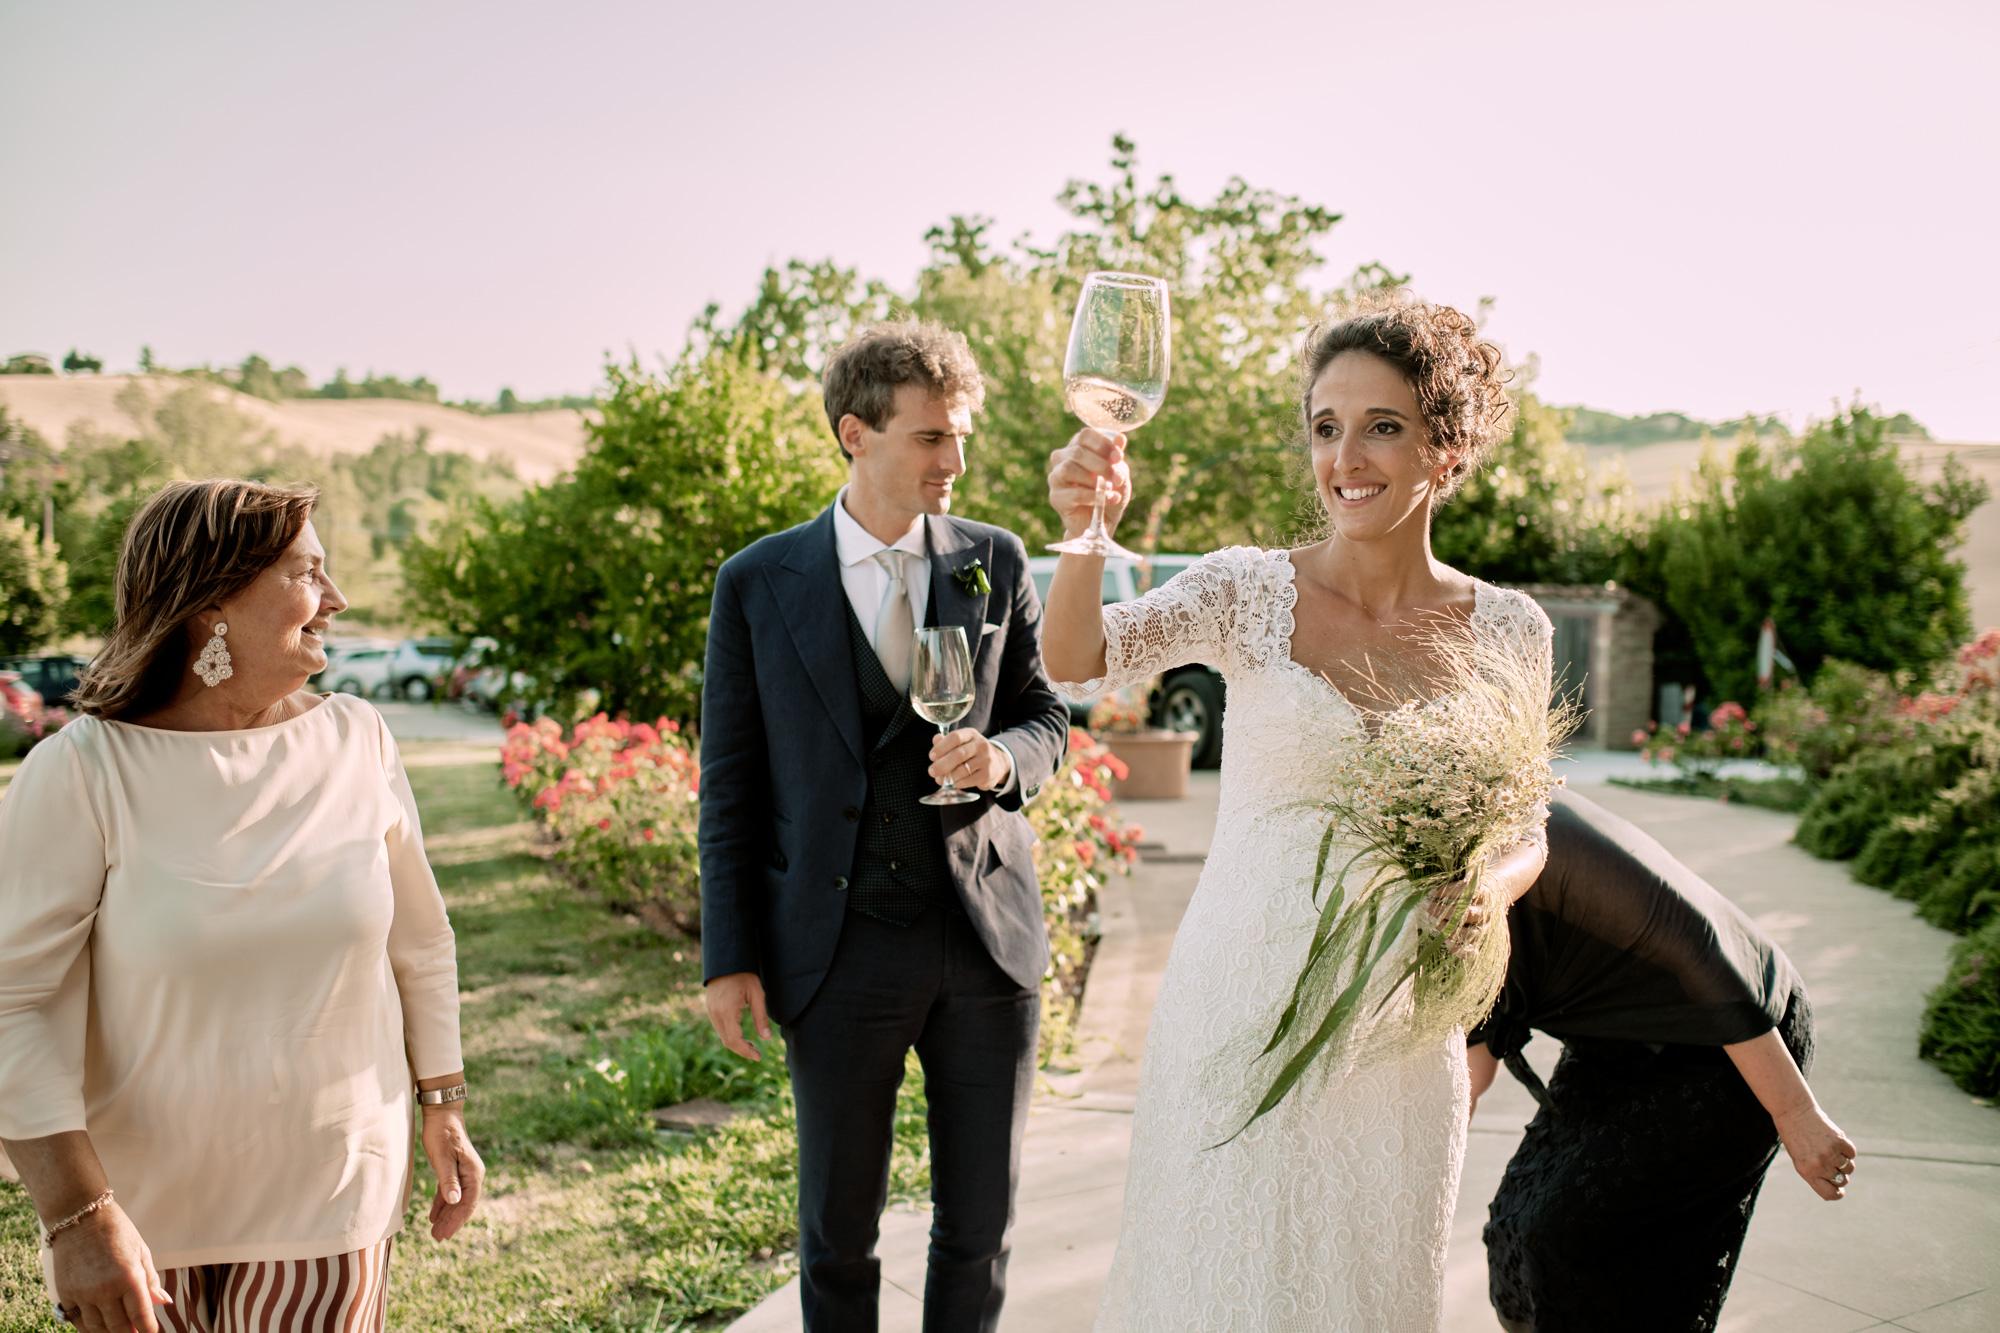 34-ivano_di_maria_fotografo_matrimonio_ margh_loren